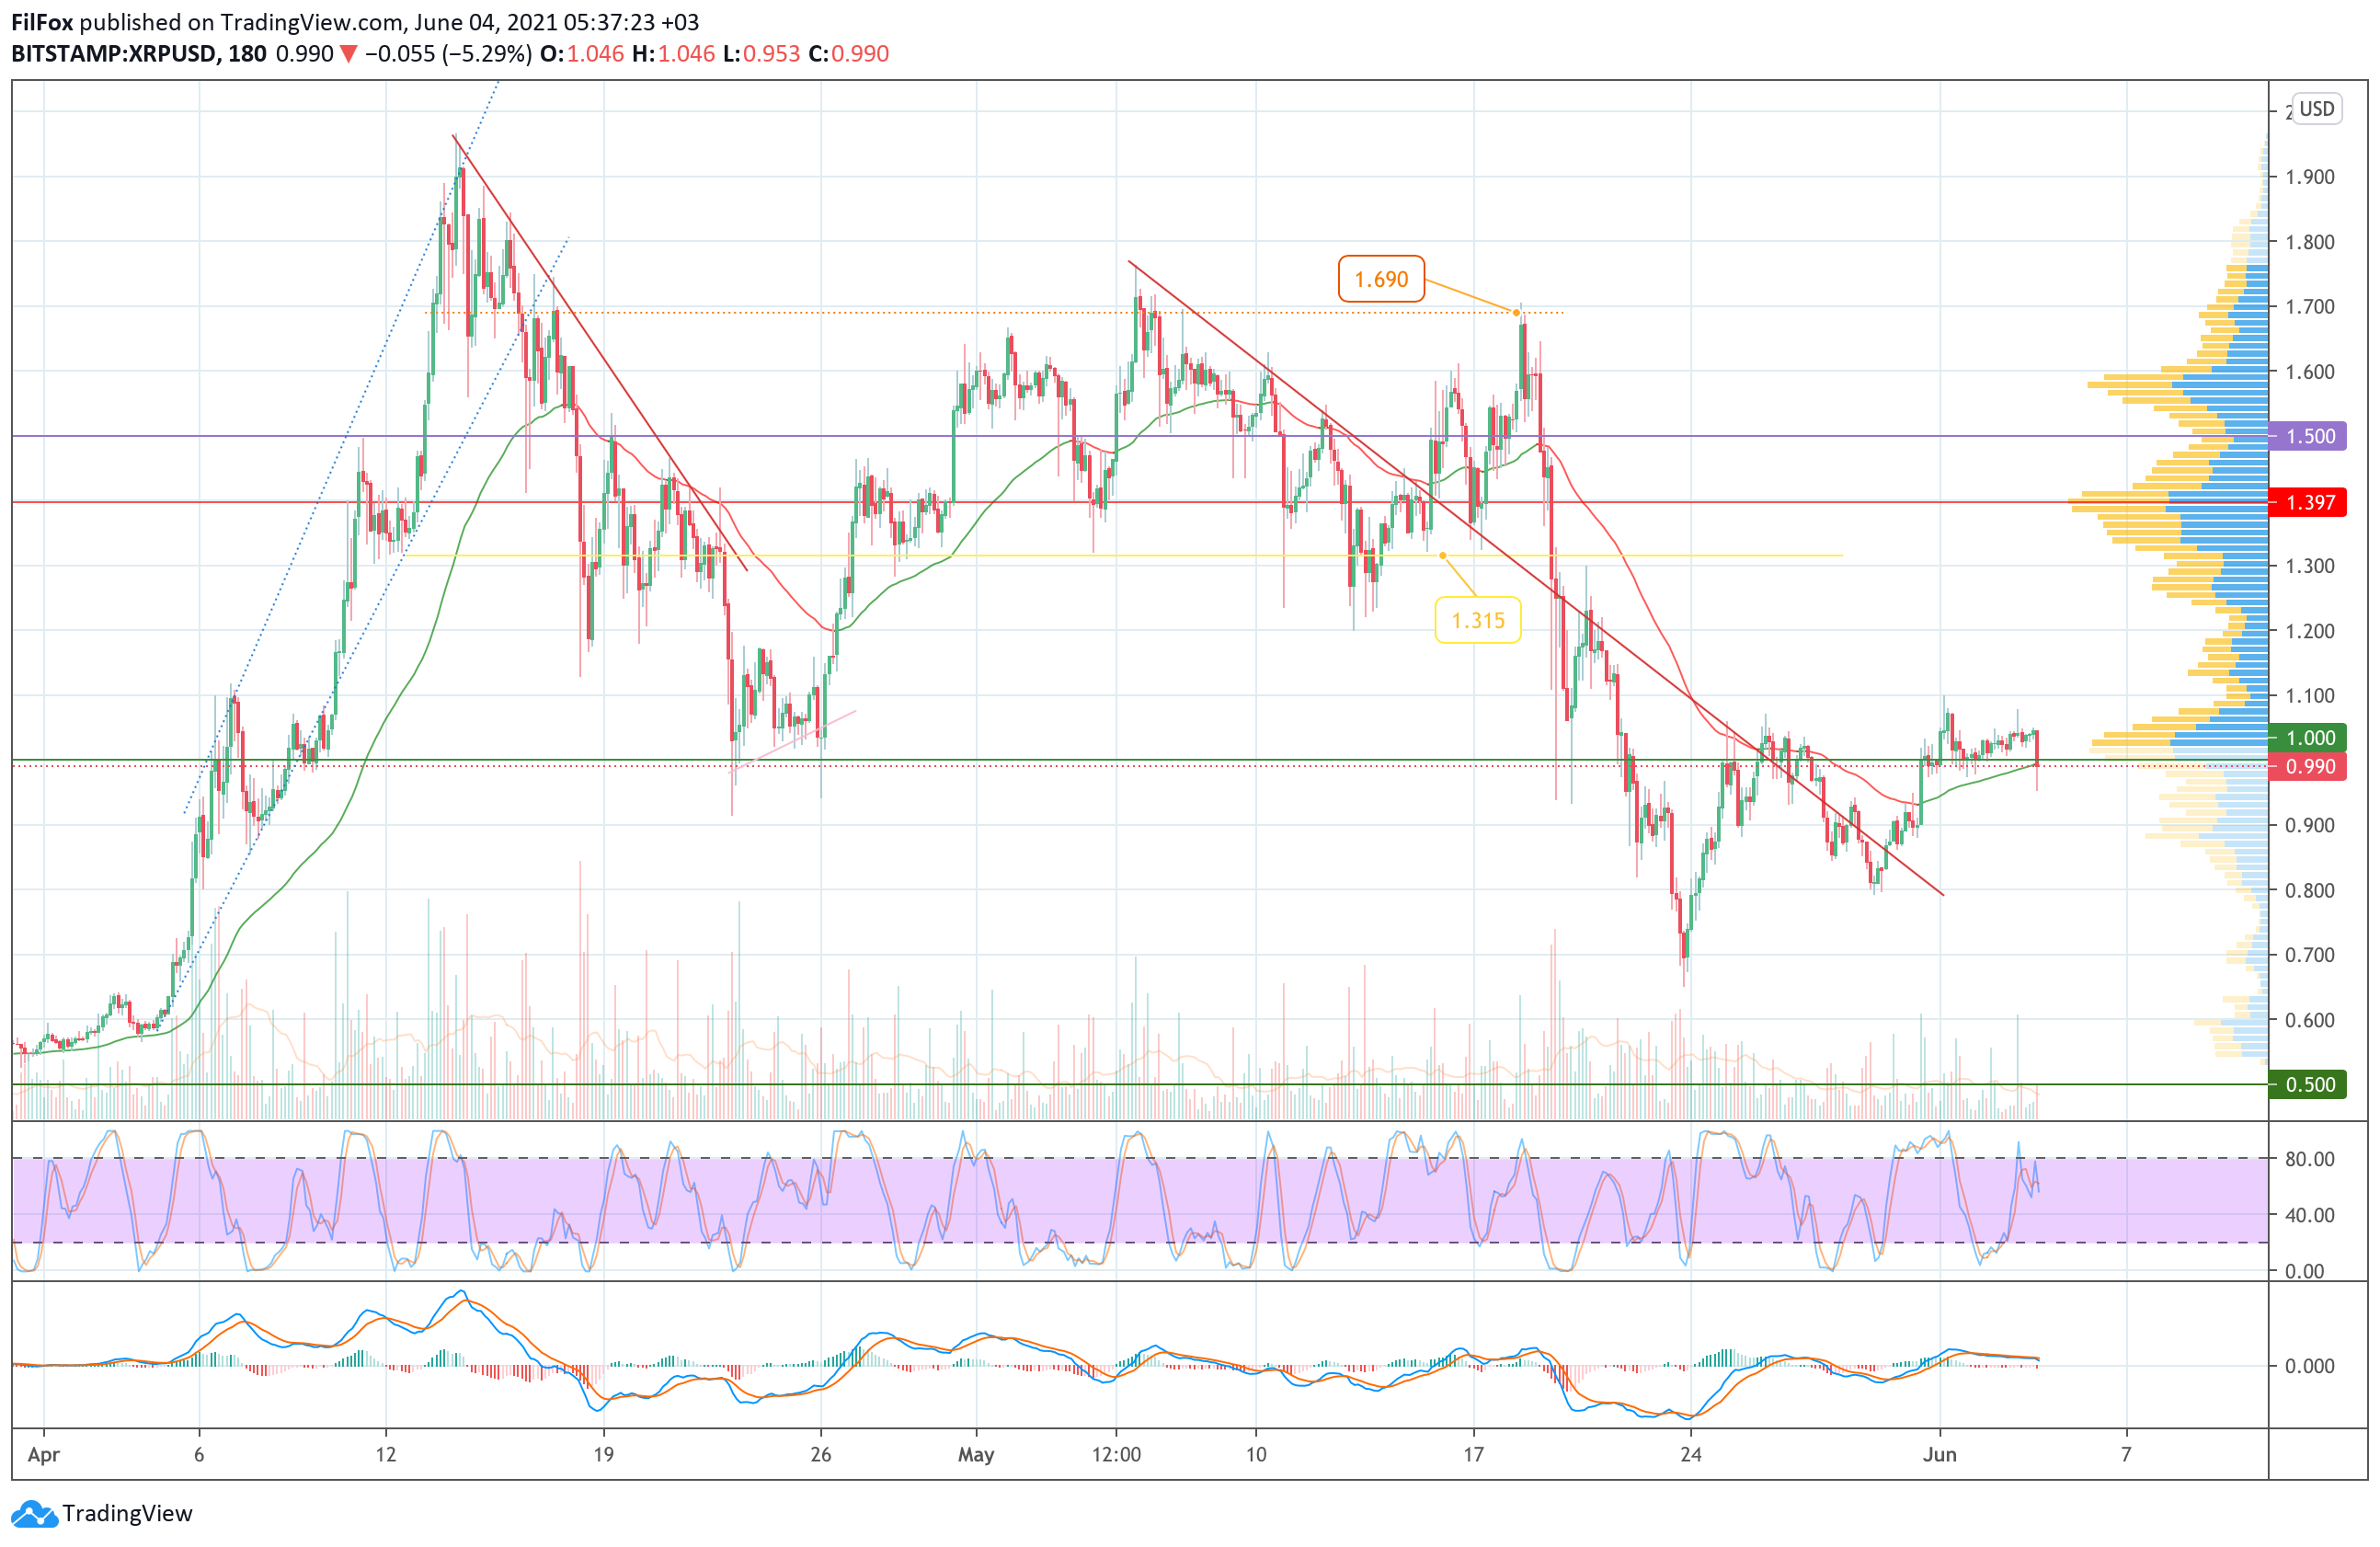 Анализ цен Bitcoin, Ethereum, XRP на 04.06.2021